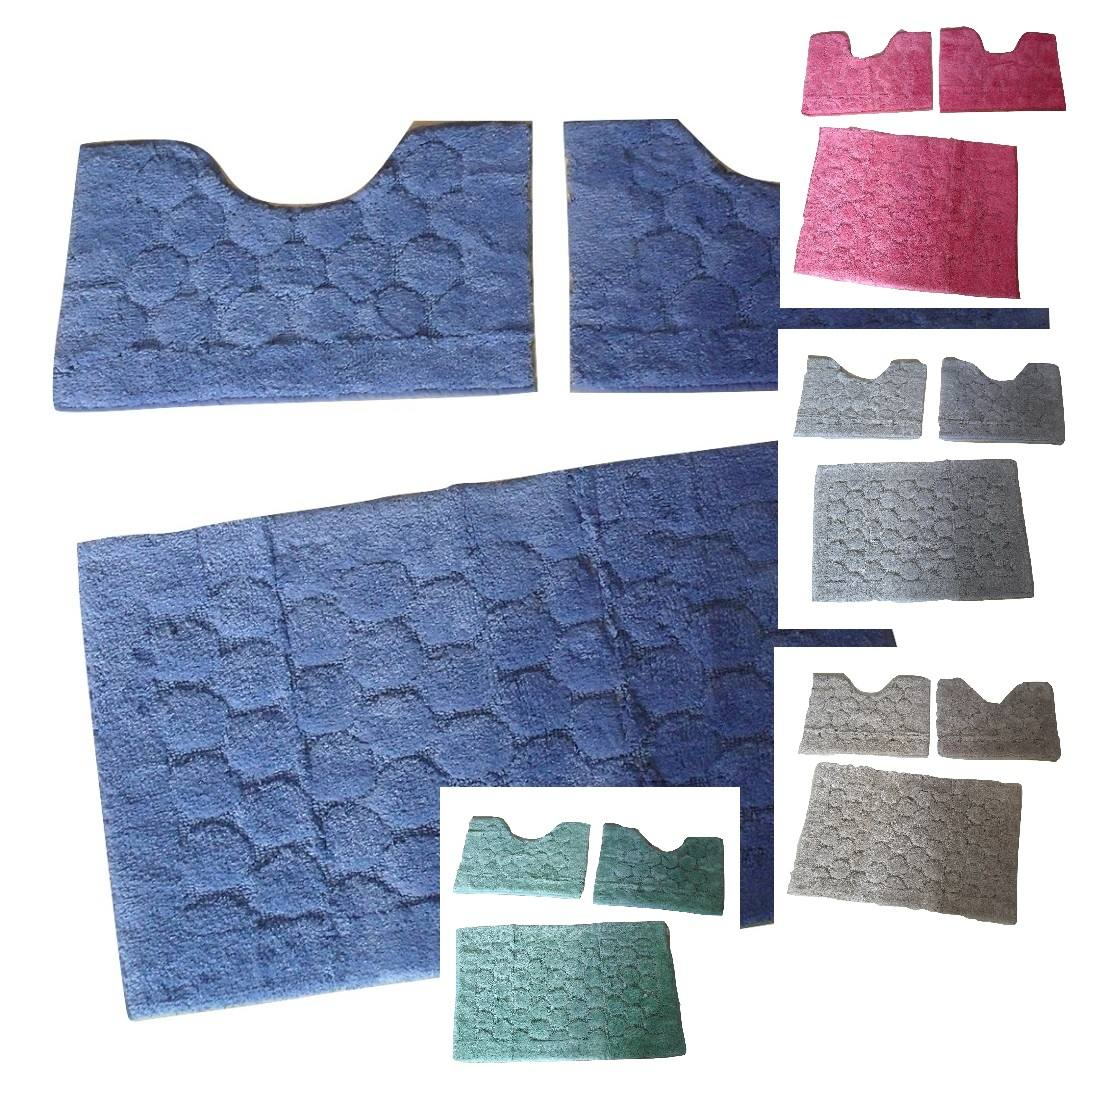 GBH-42329 - tappeti per bagno, tappeto bagno - genny biancheria ...